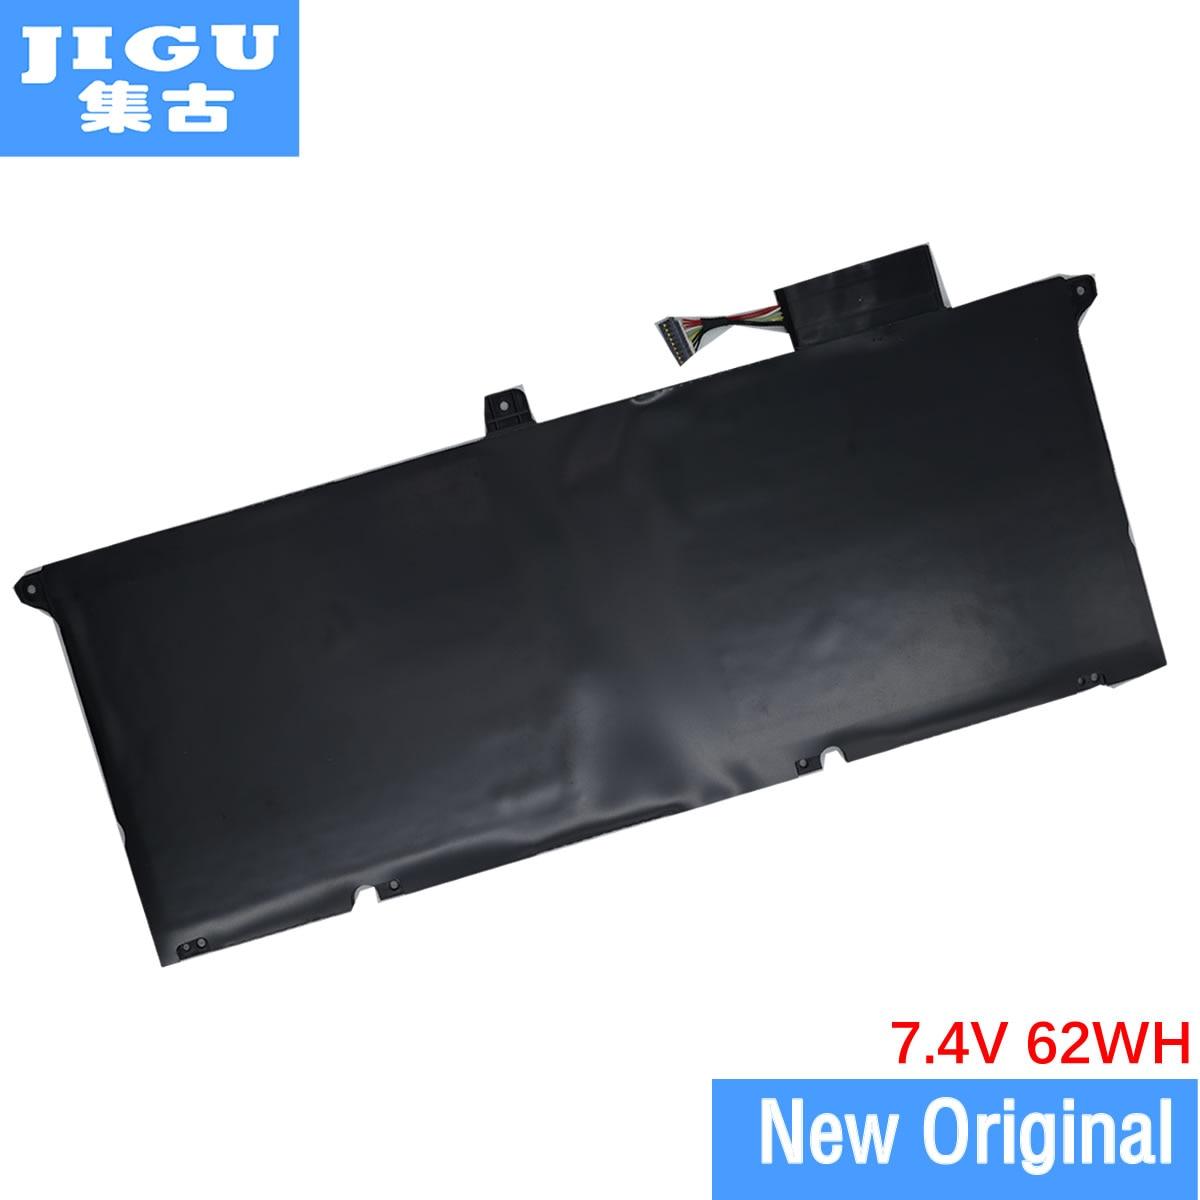 JIGU 8400mAh AA-PBXN8AR Replacement Laptop Battery For Samsung 900X4 900X46 900X4B-A01DE 900X4B-A01FR 900X4B-A03 NP900X4 hot sale replacement laptop battery for samsung 7800mah 11 1v 3530ea aa pb9nc6b aa pb9nc6w r580 r428